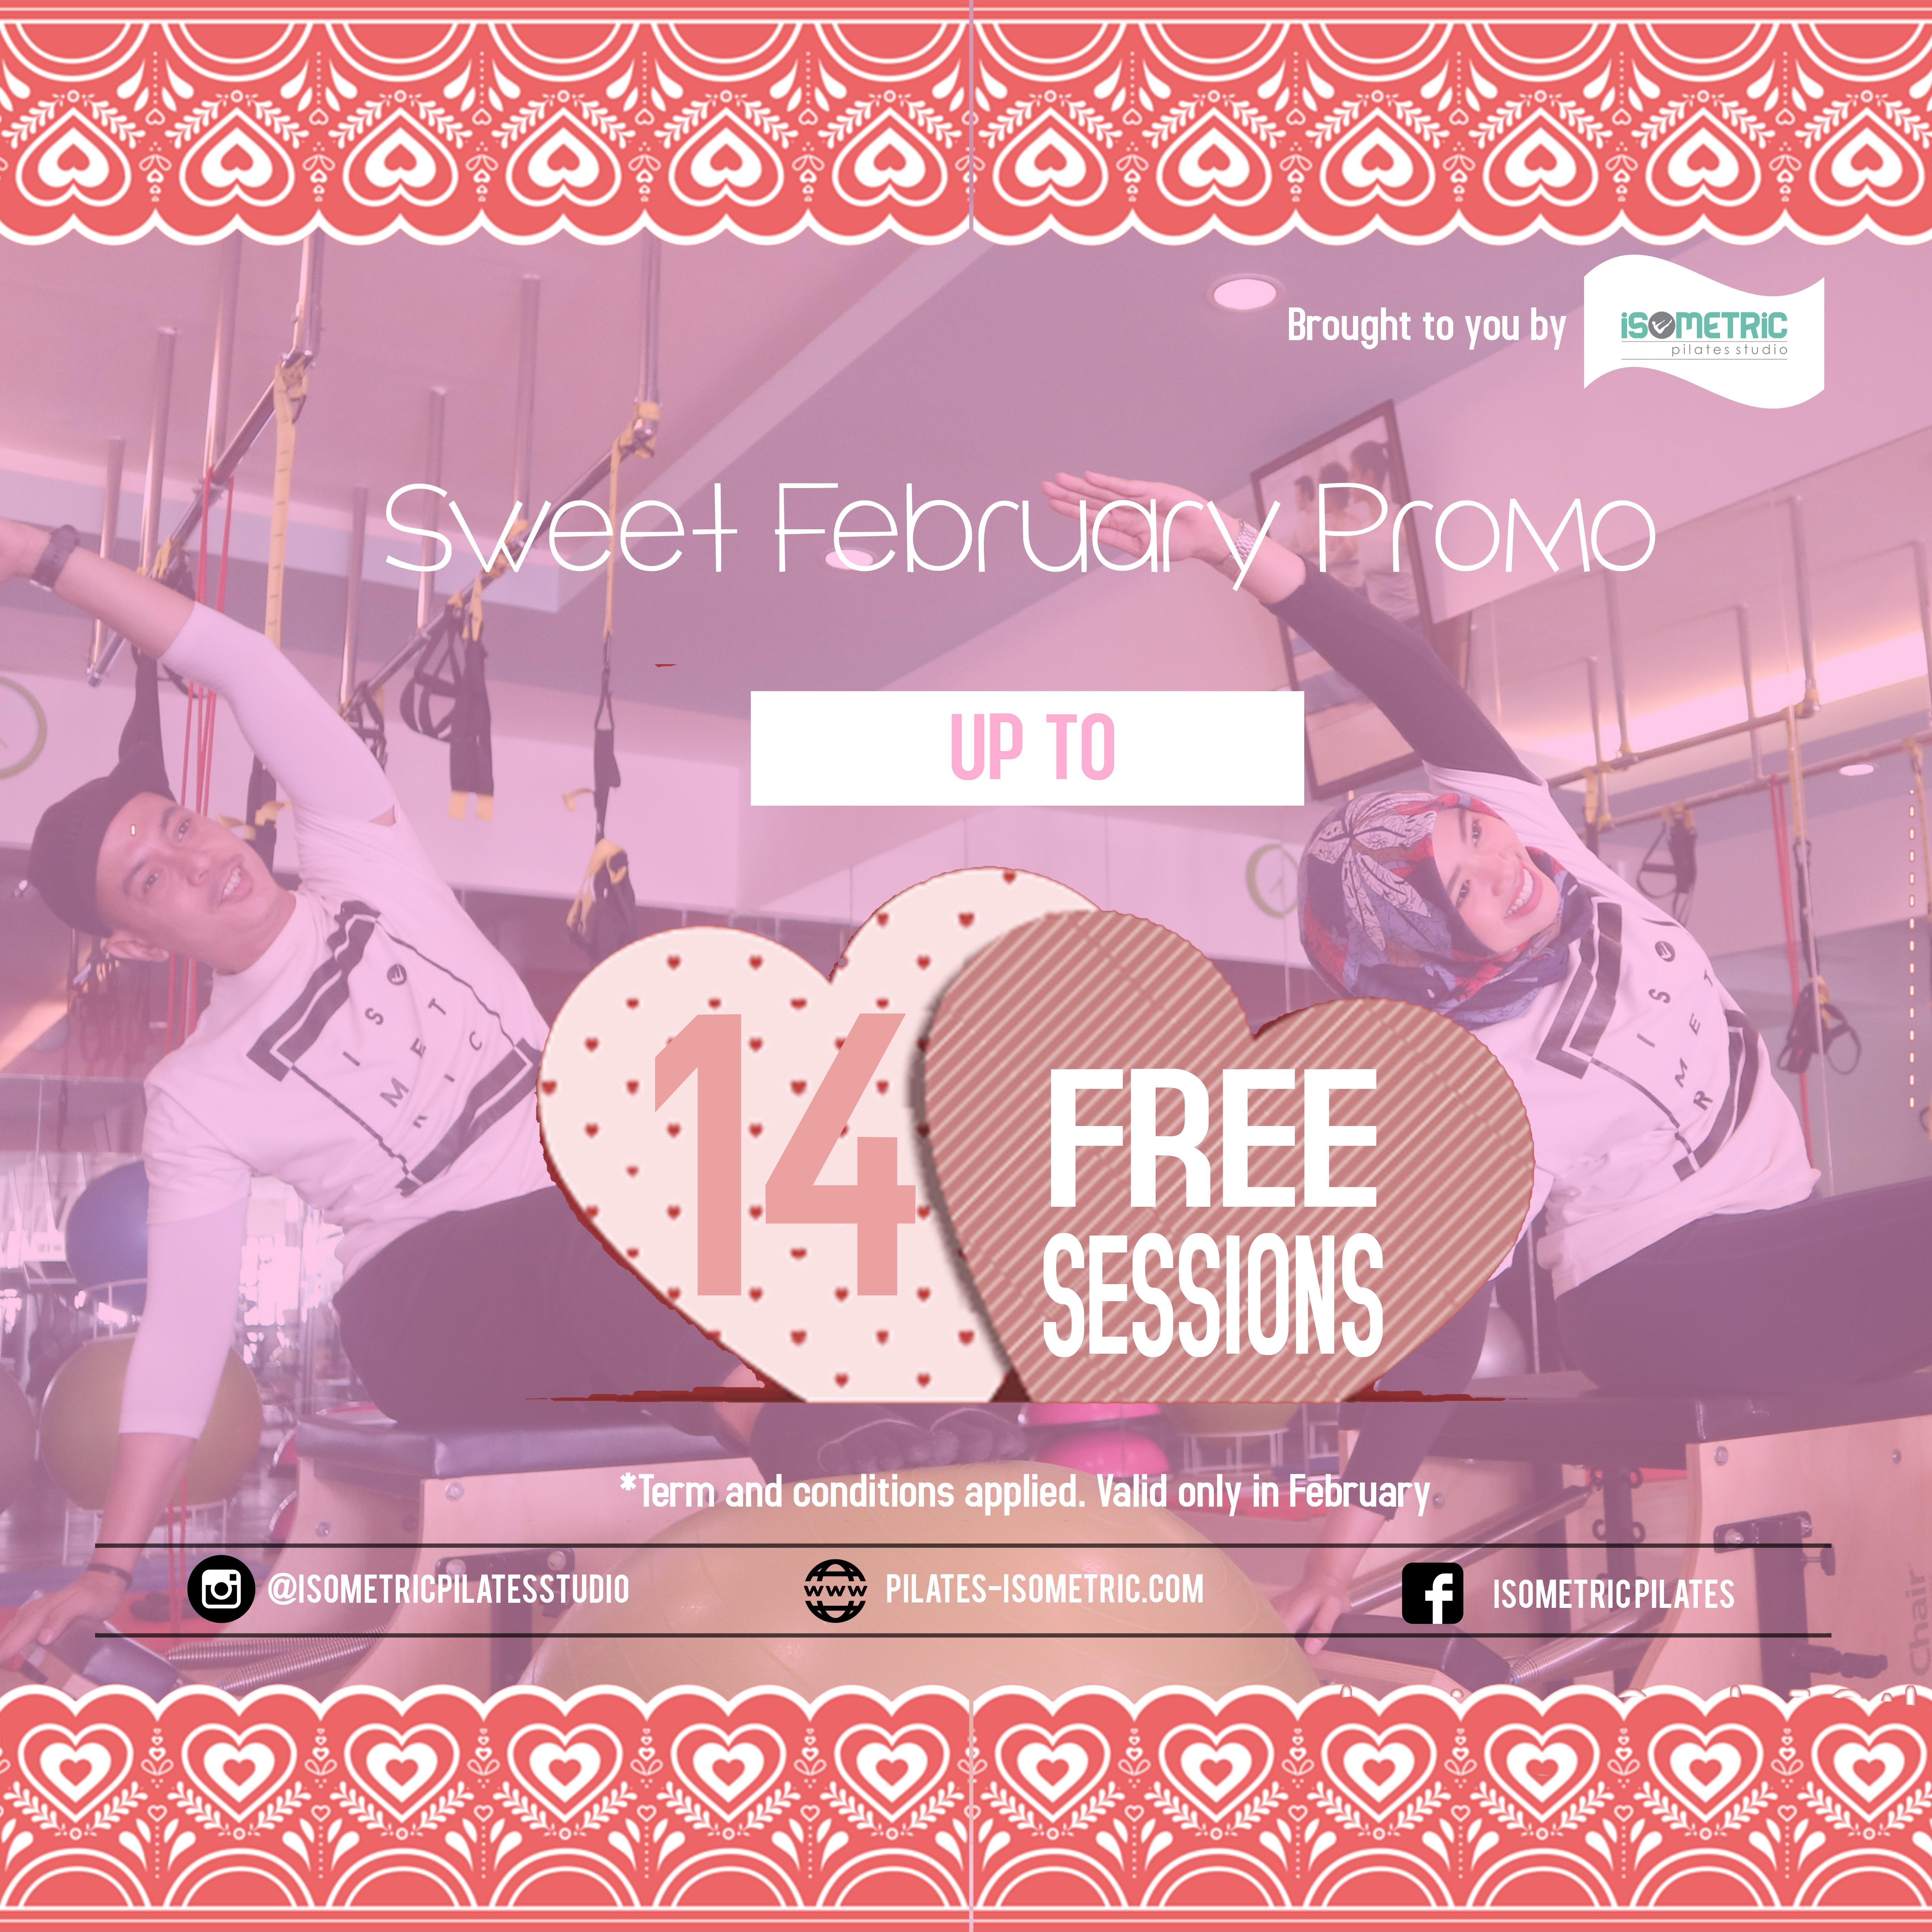 Pilates Sweet February Promo